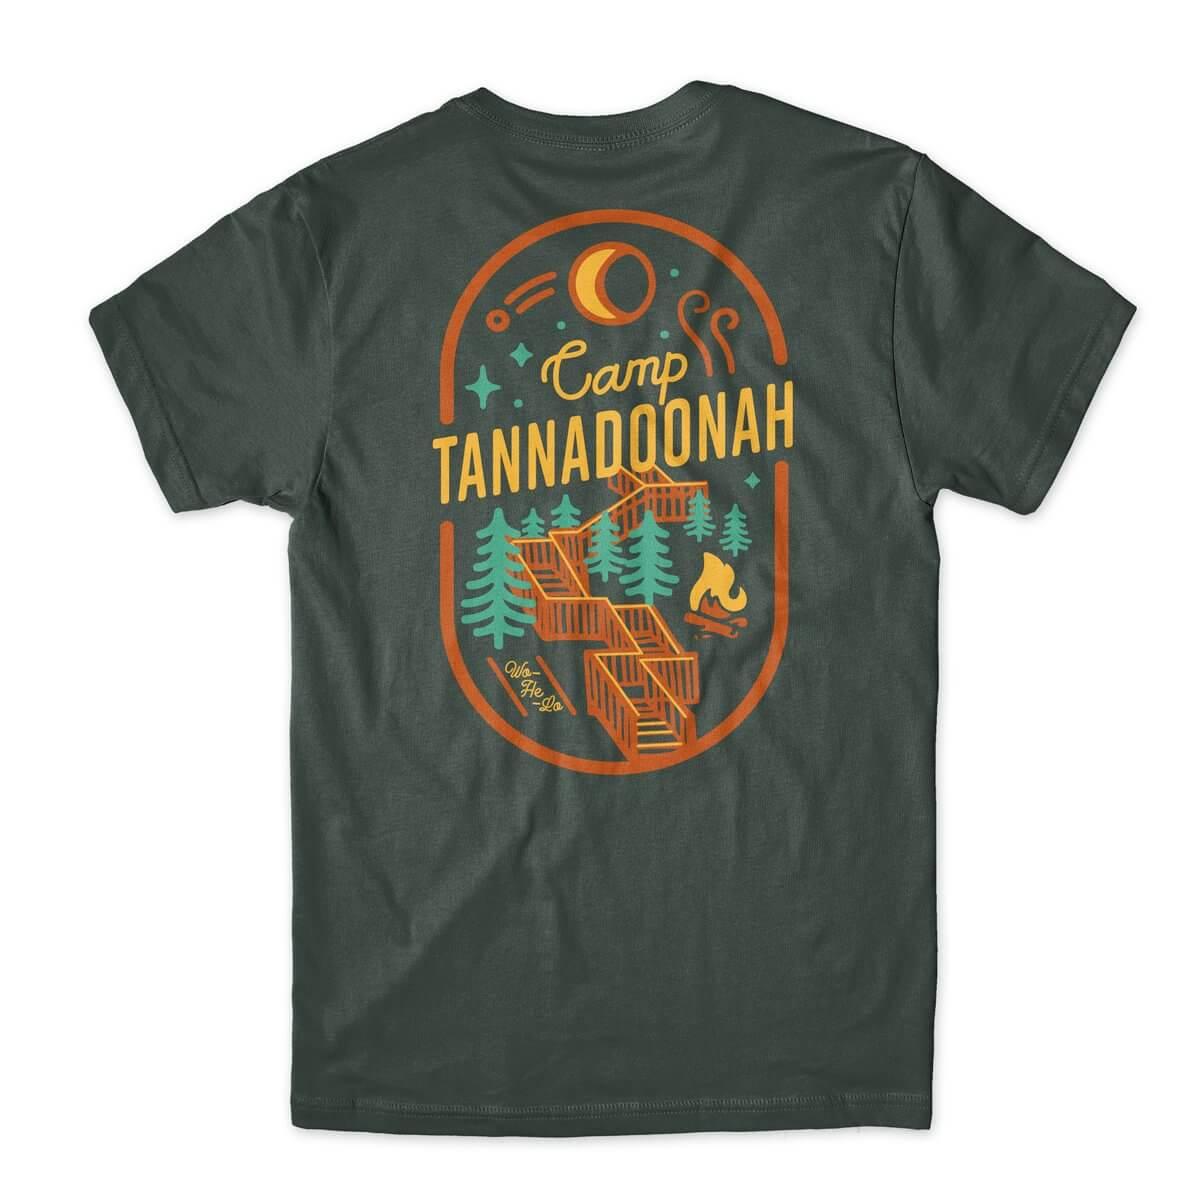 Camp Tannadoonah Stairs t-shirt